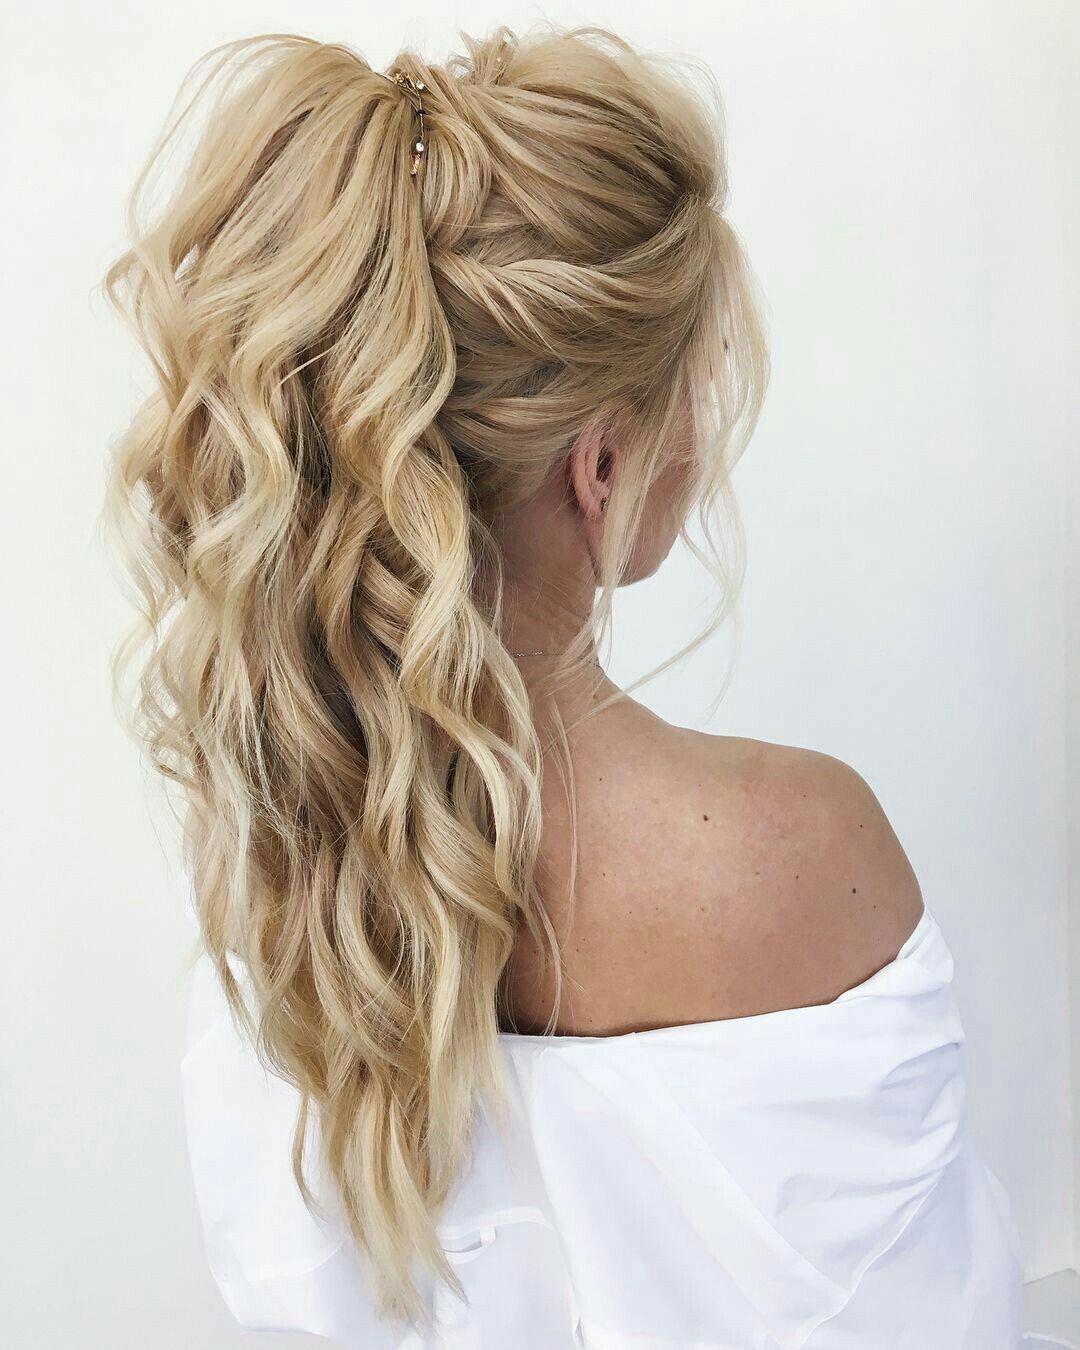 hair style   ⇨hair style in 2019   prom hair, hair styles